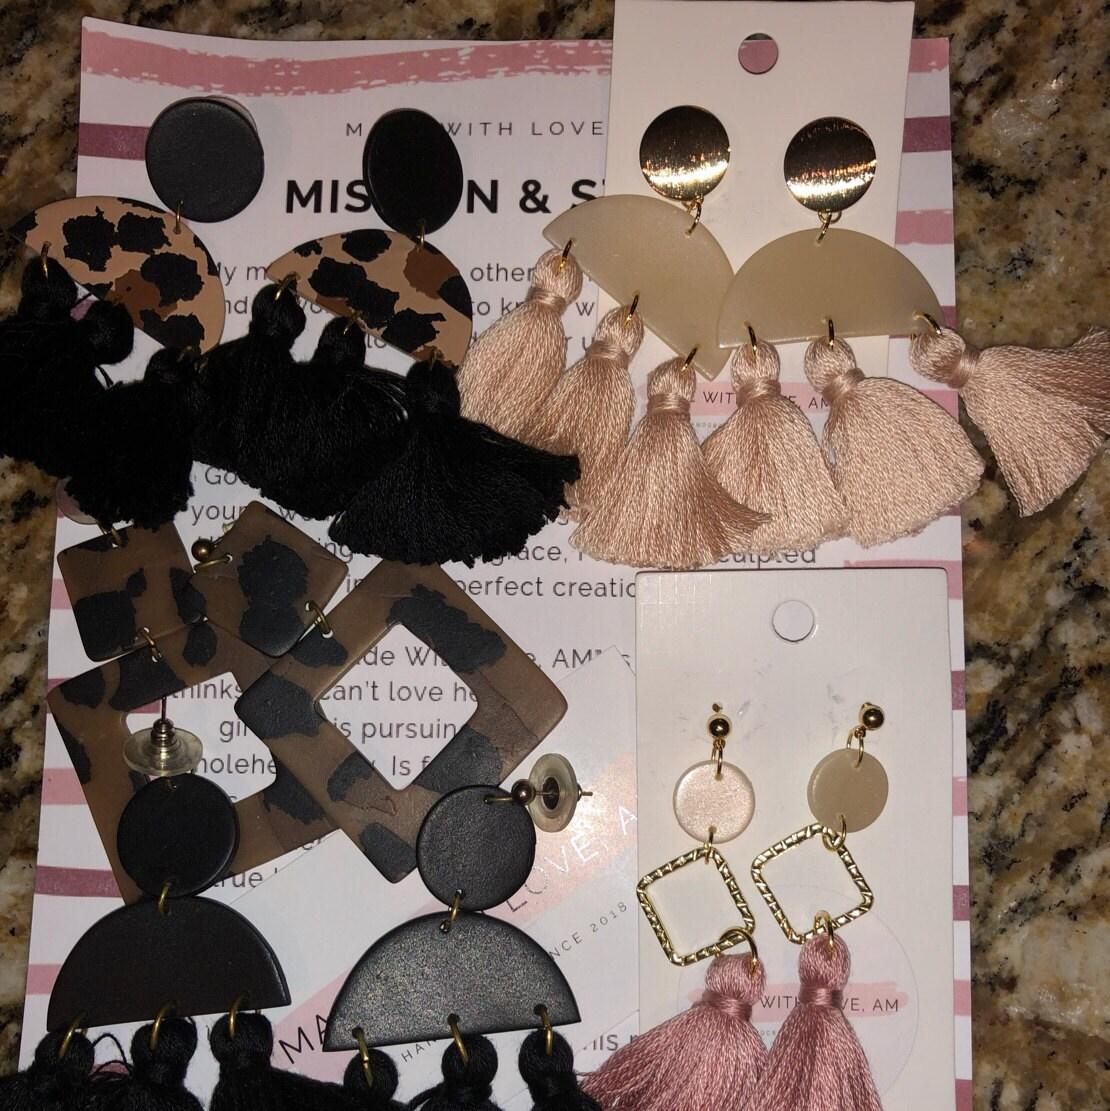 teresa arana added a photo of their purchase